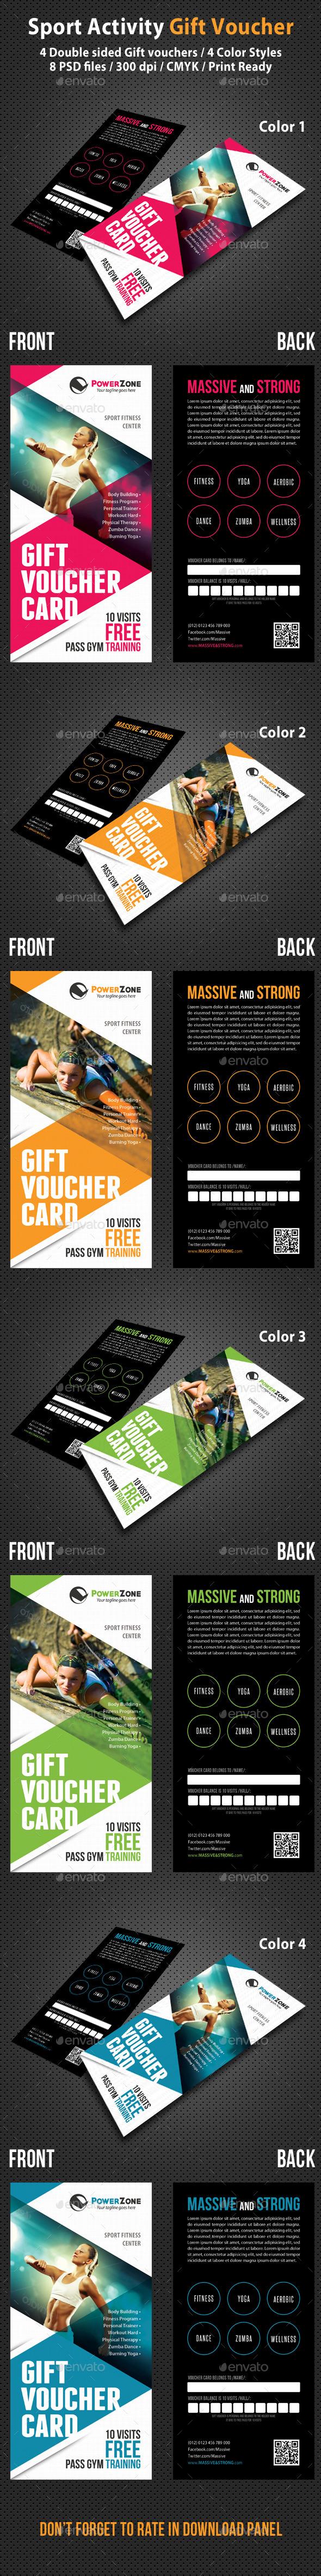 Sport Activity Gift Voucher 03 - Cards & Invites Print Templates